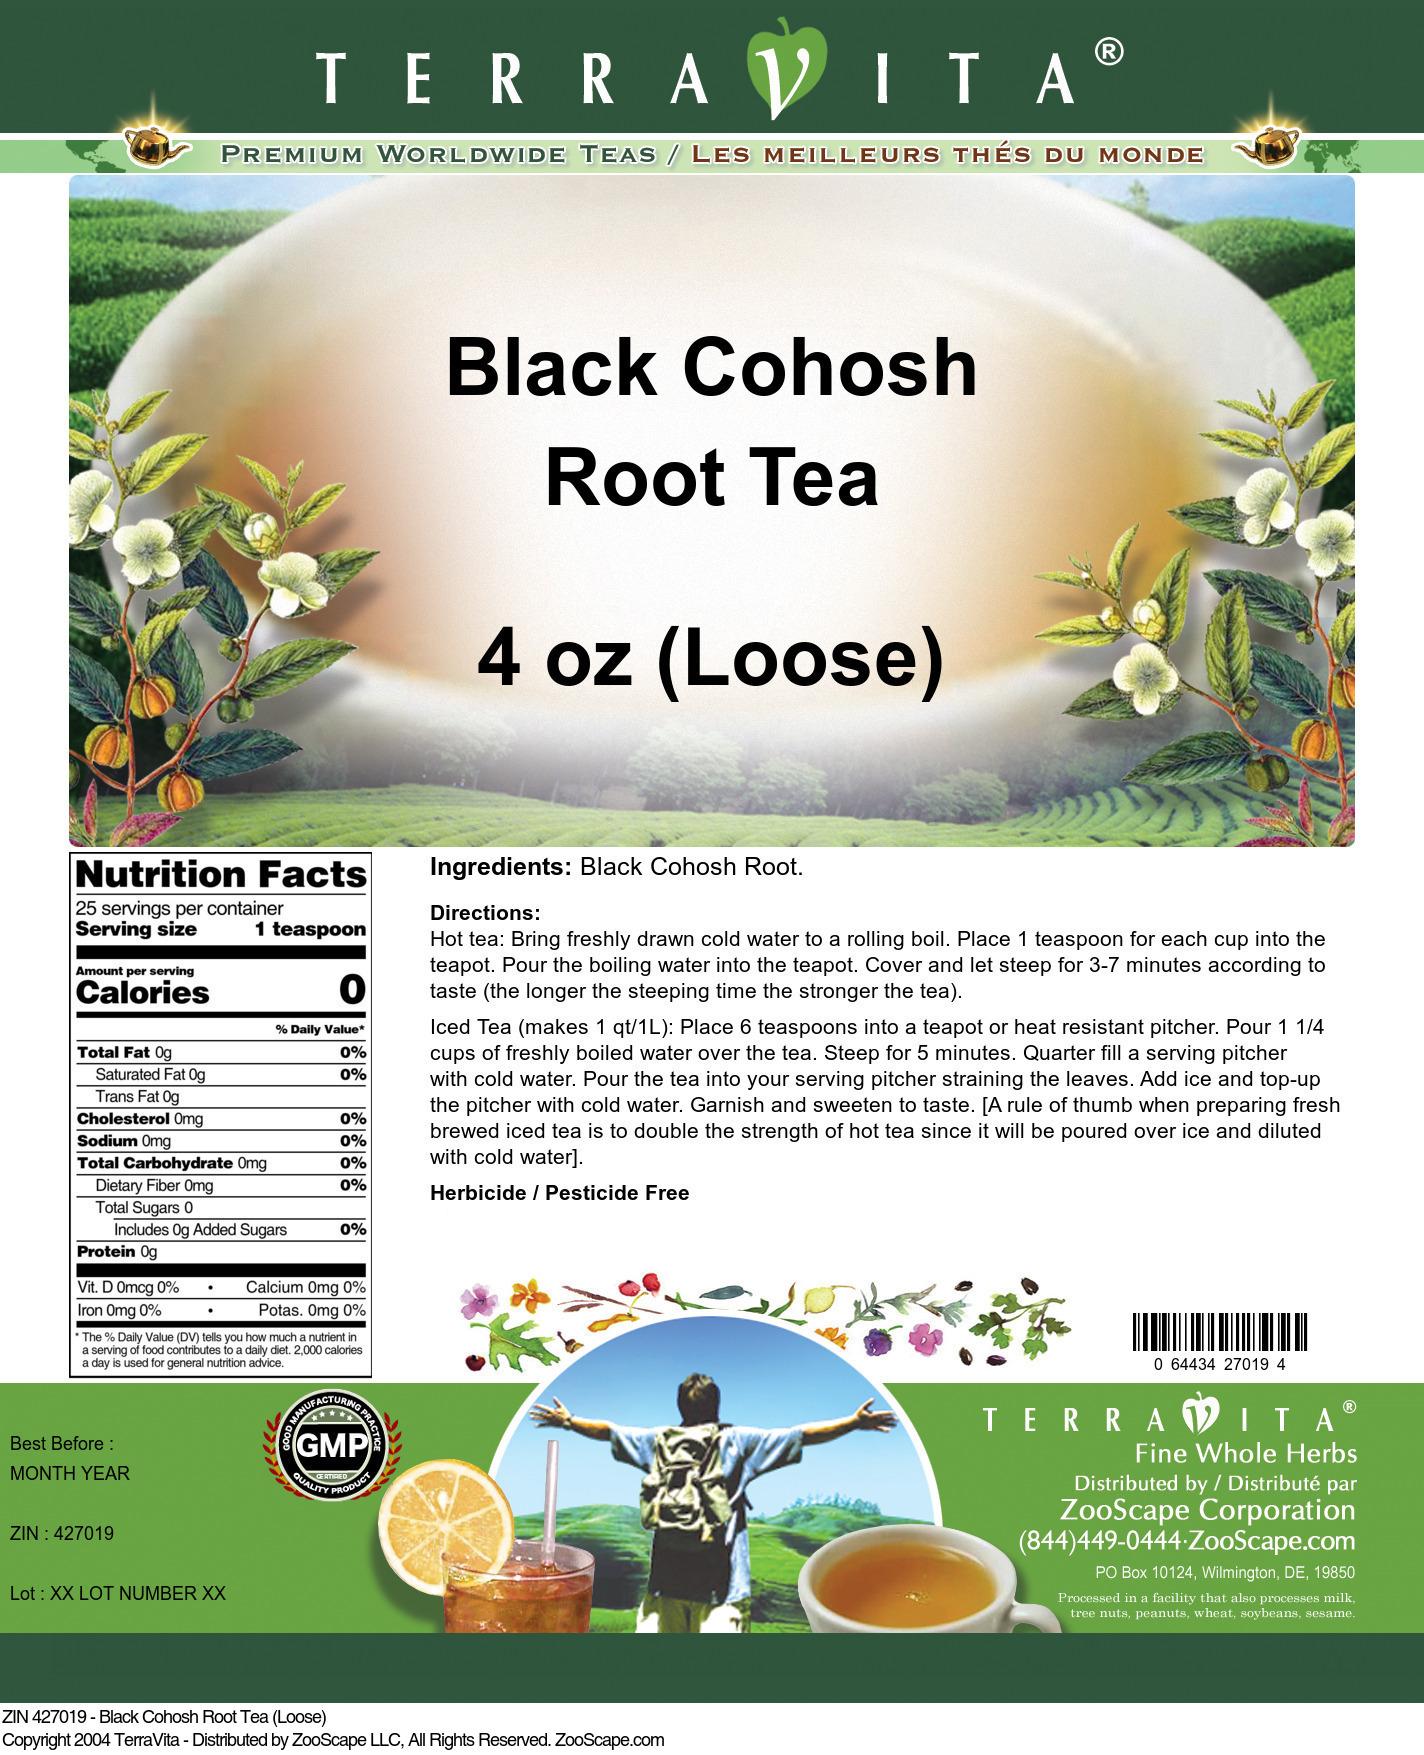 Black Cohosh Root Tea (Loose)